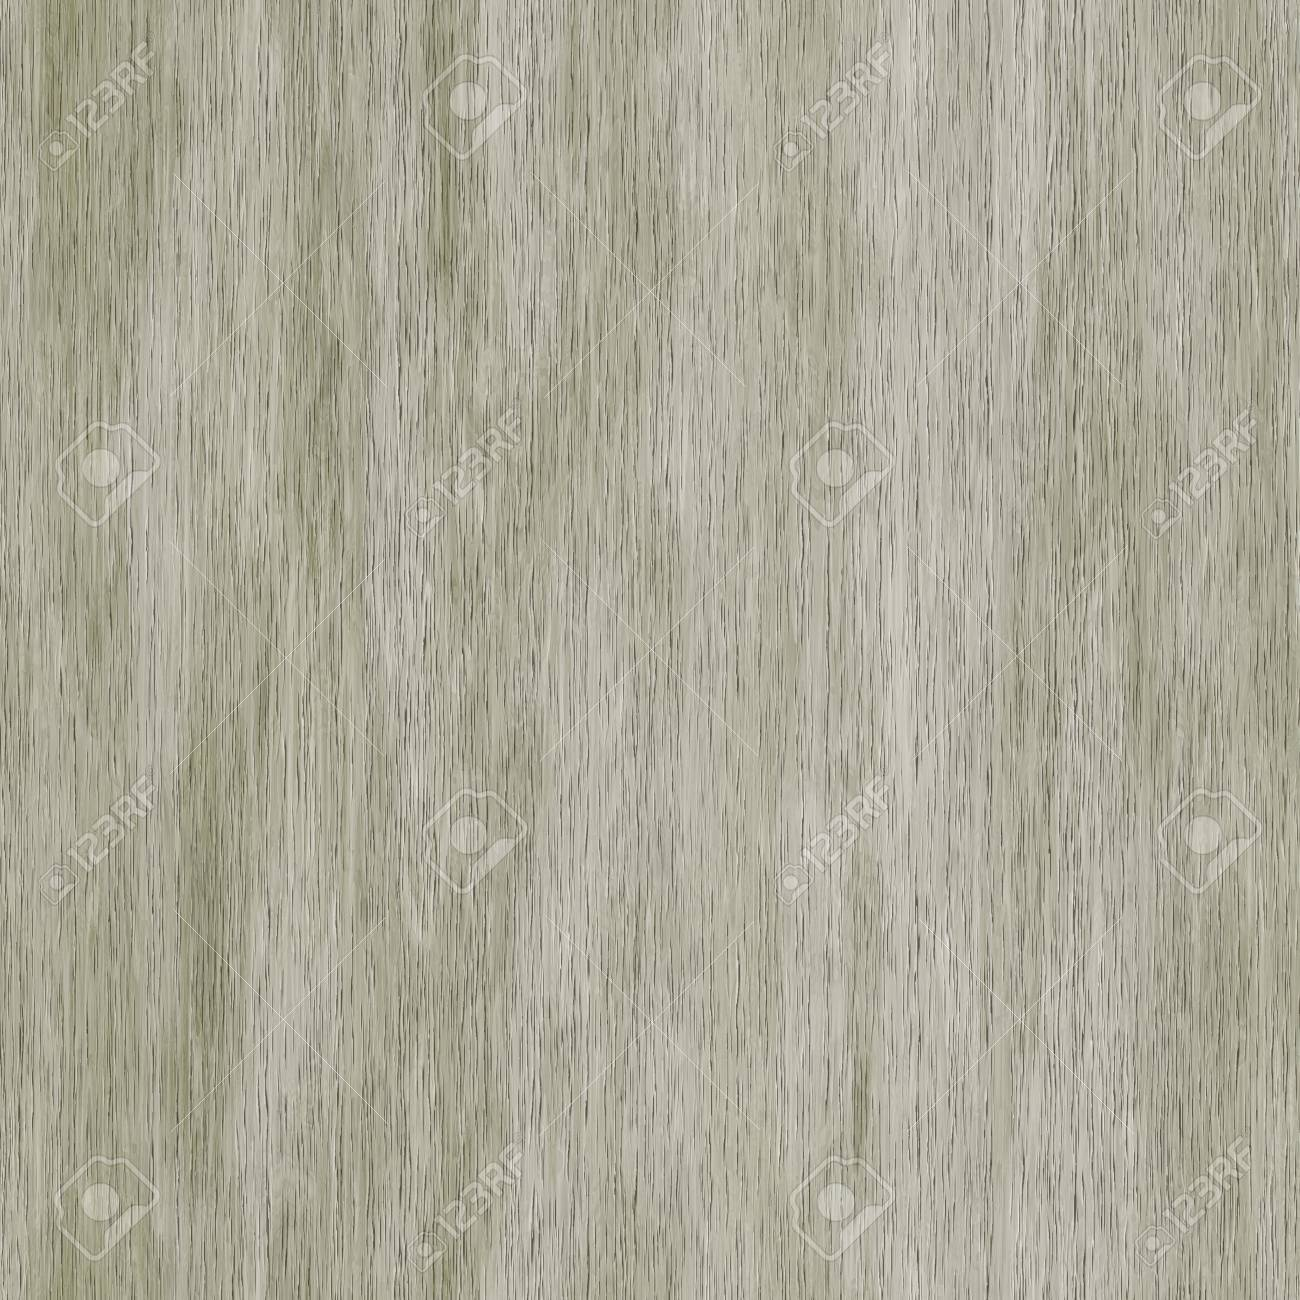 seamless light wood floor.  Seamless Light Wood Seamless Texture Or Background Stock Photo  46116842 On Seamless Wood Floor